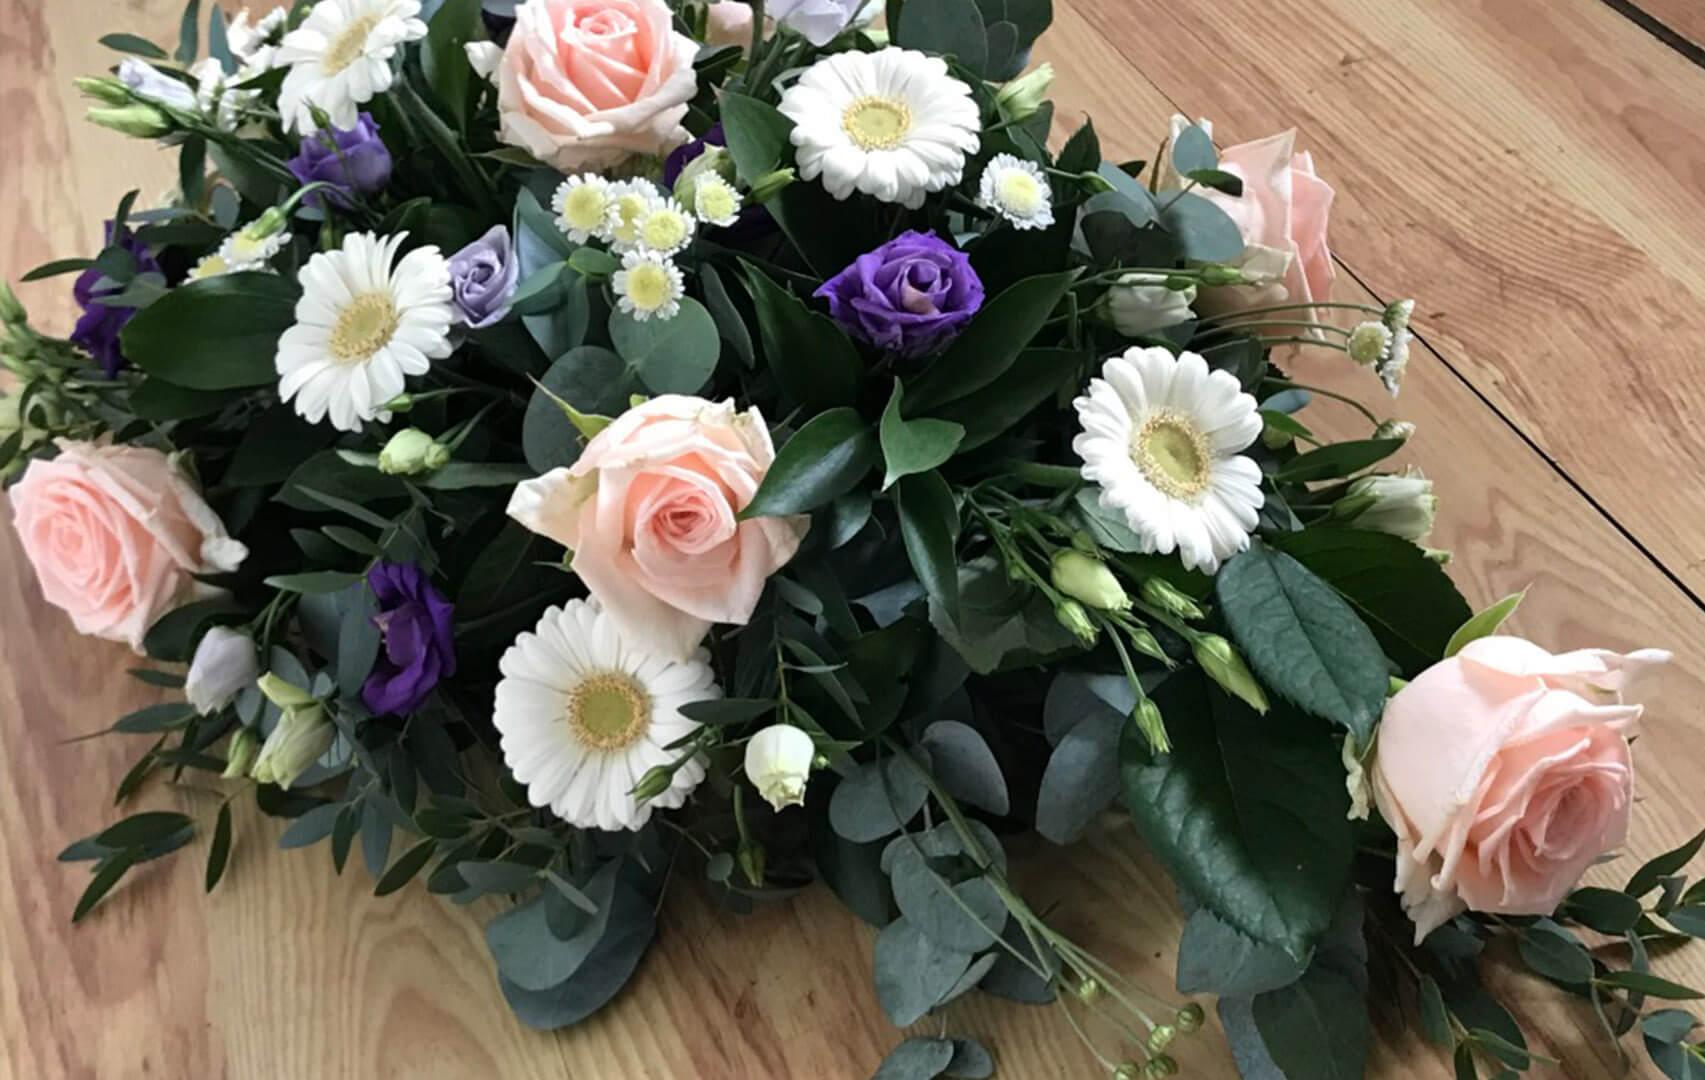 Funeral Flowers 11